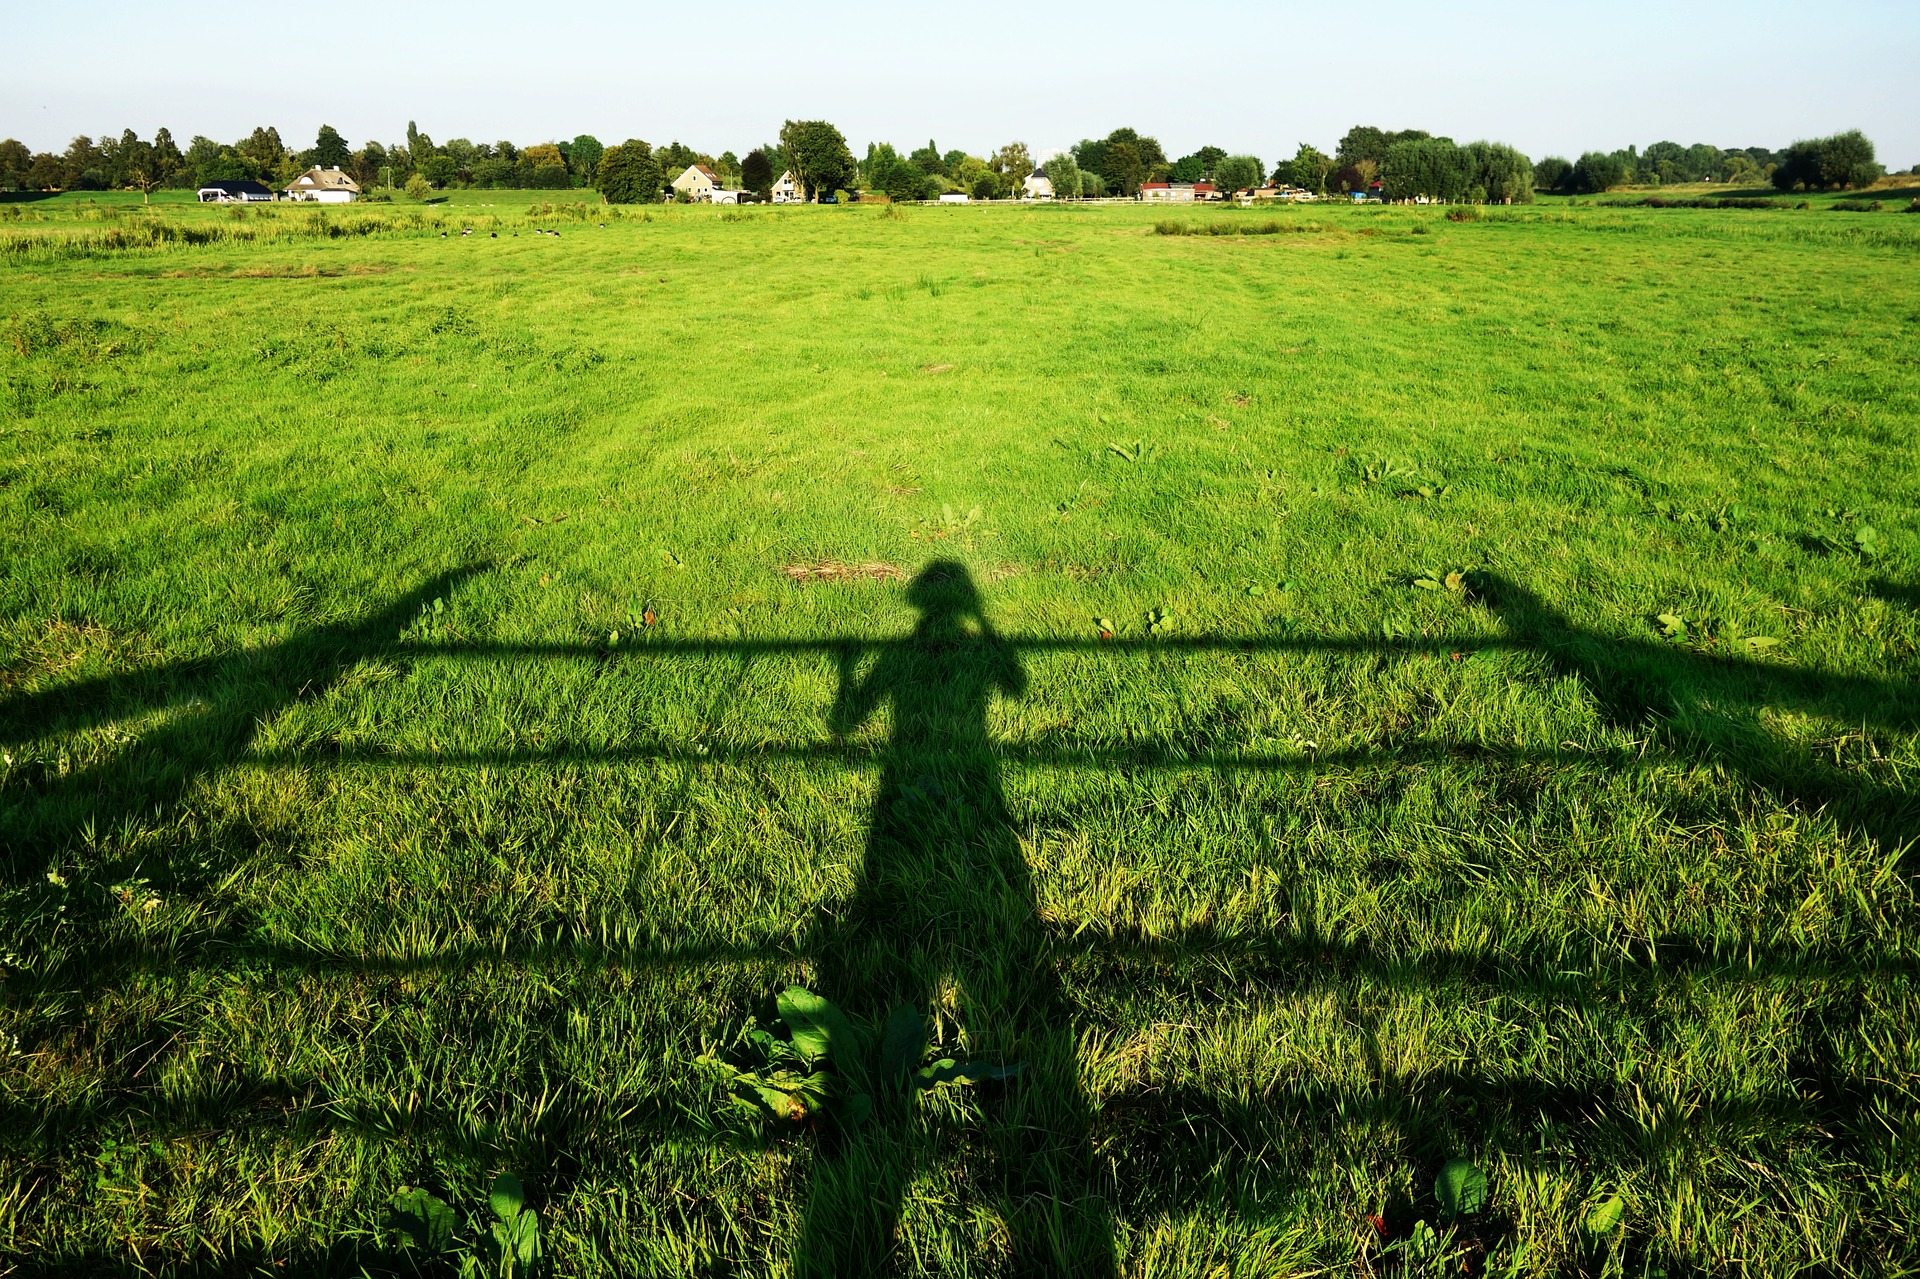 shadow-1635226_1920.jpg